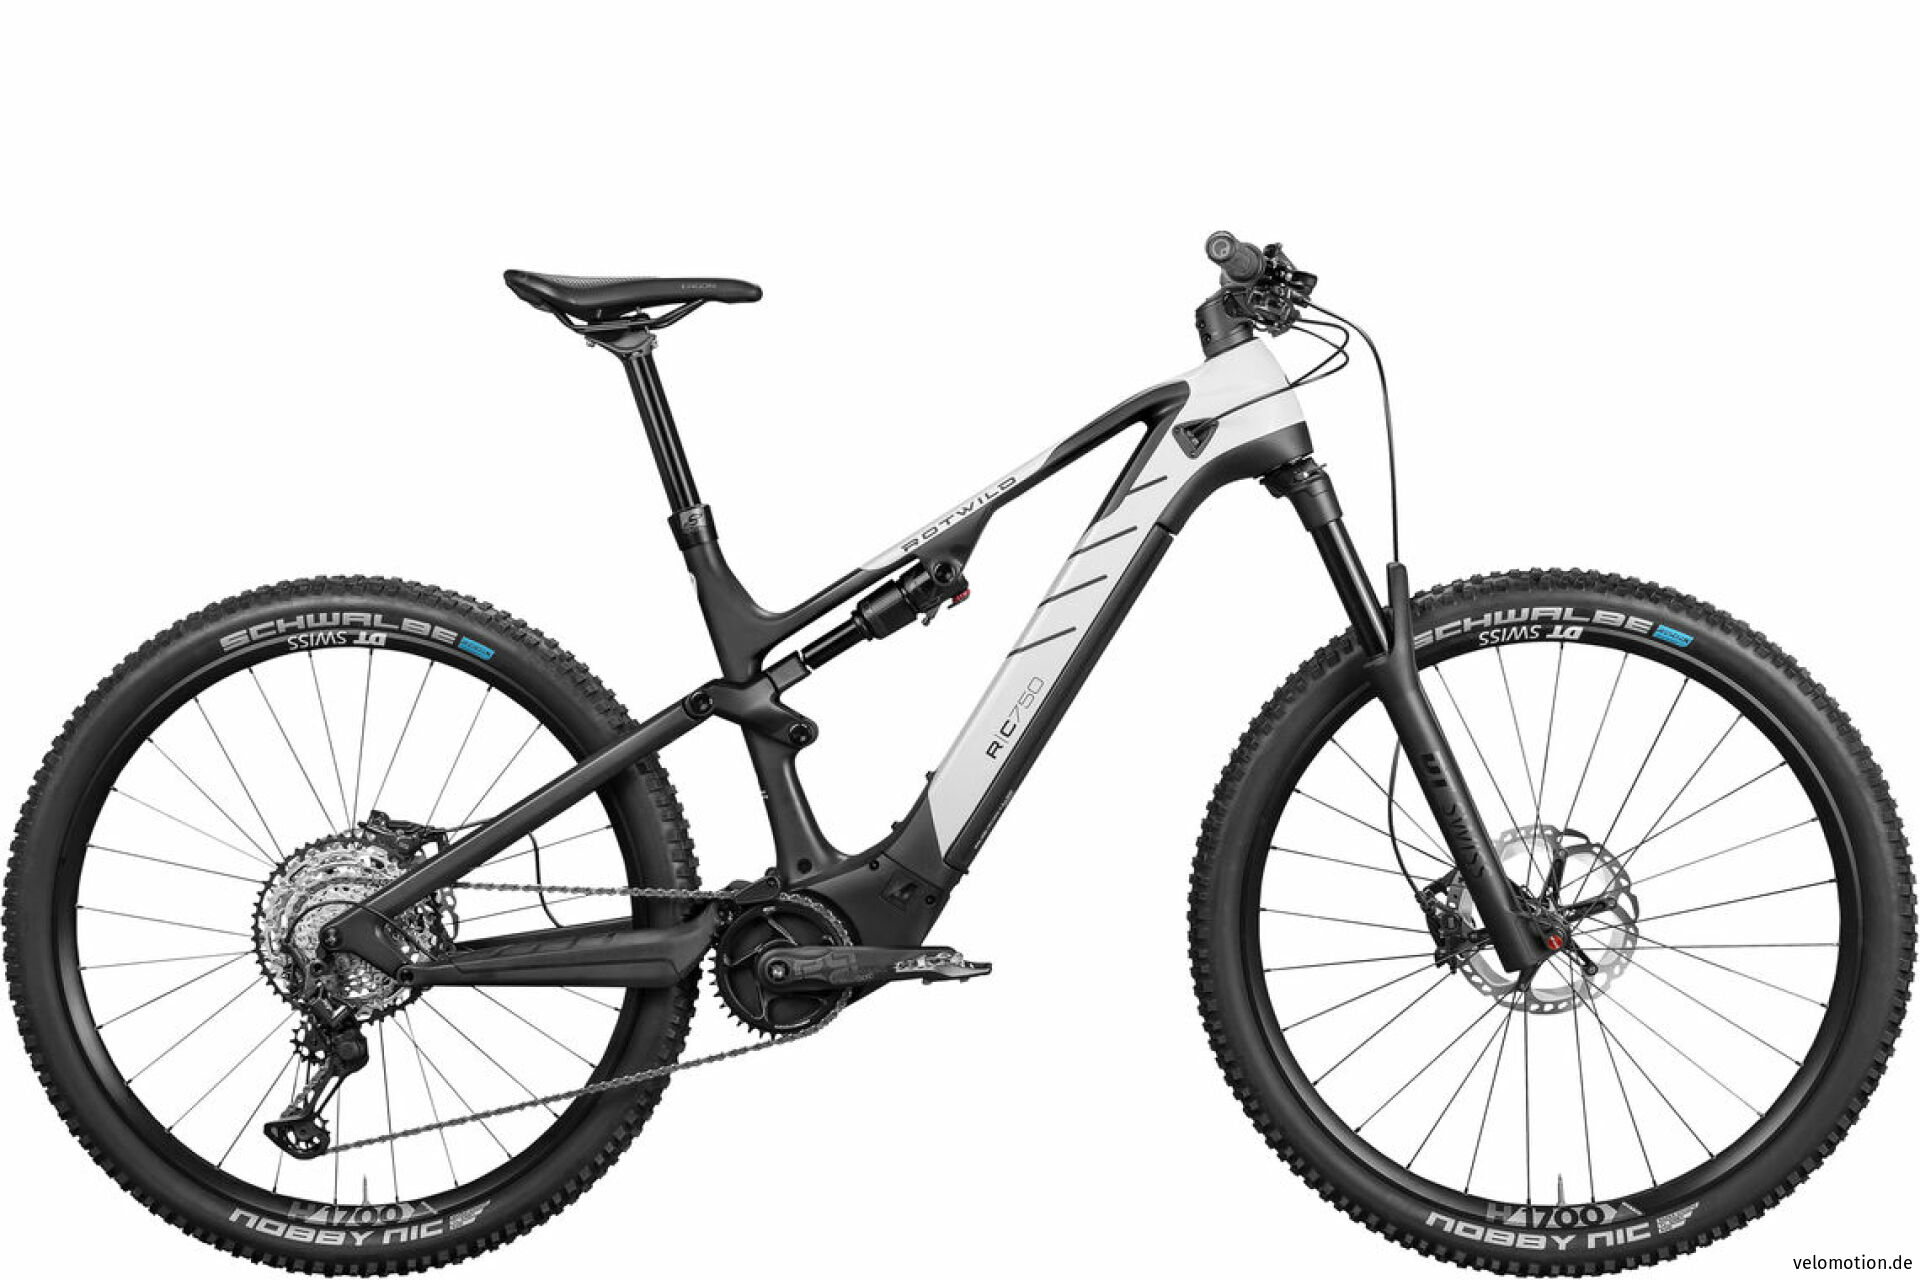 R.C750 FS Pro #1